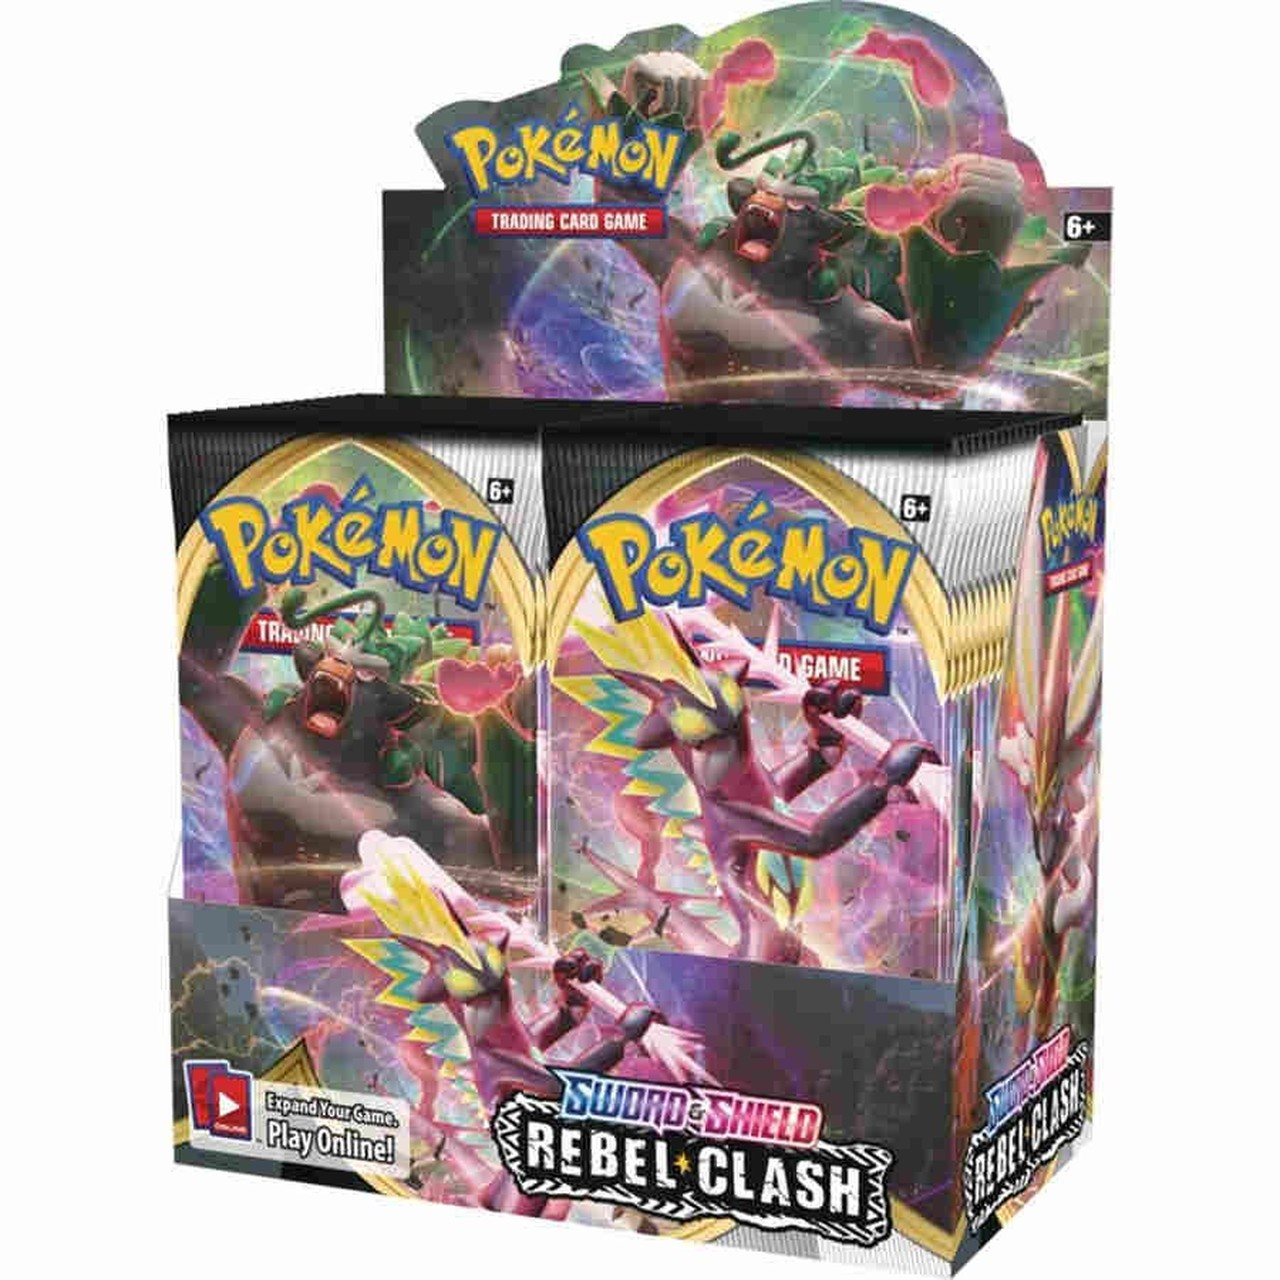 Pokemon Tcg : ดาบ & โล่ 2 Rebel Clash Booster ( 1 กล่อง 36 แพ็ค )